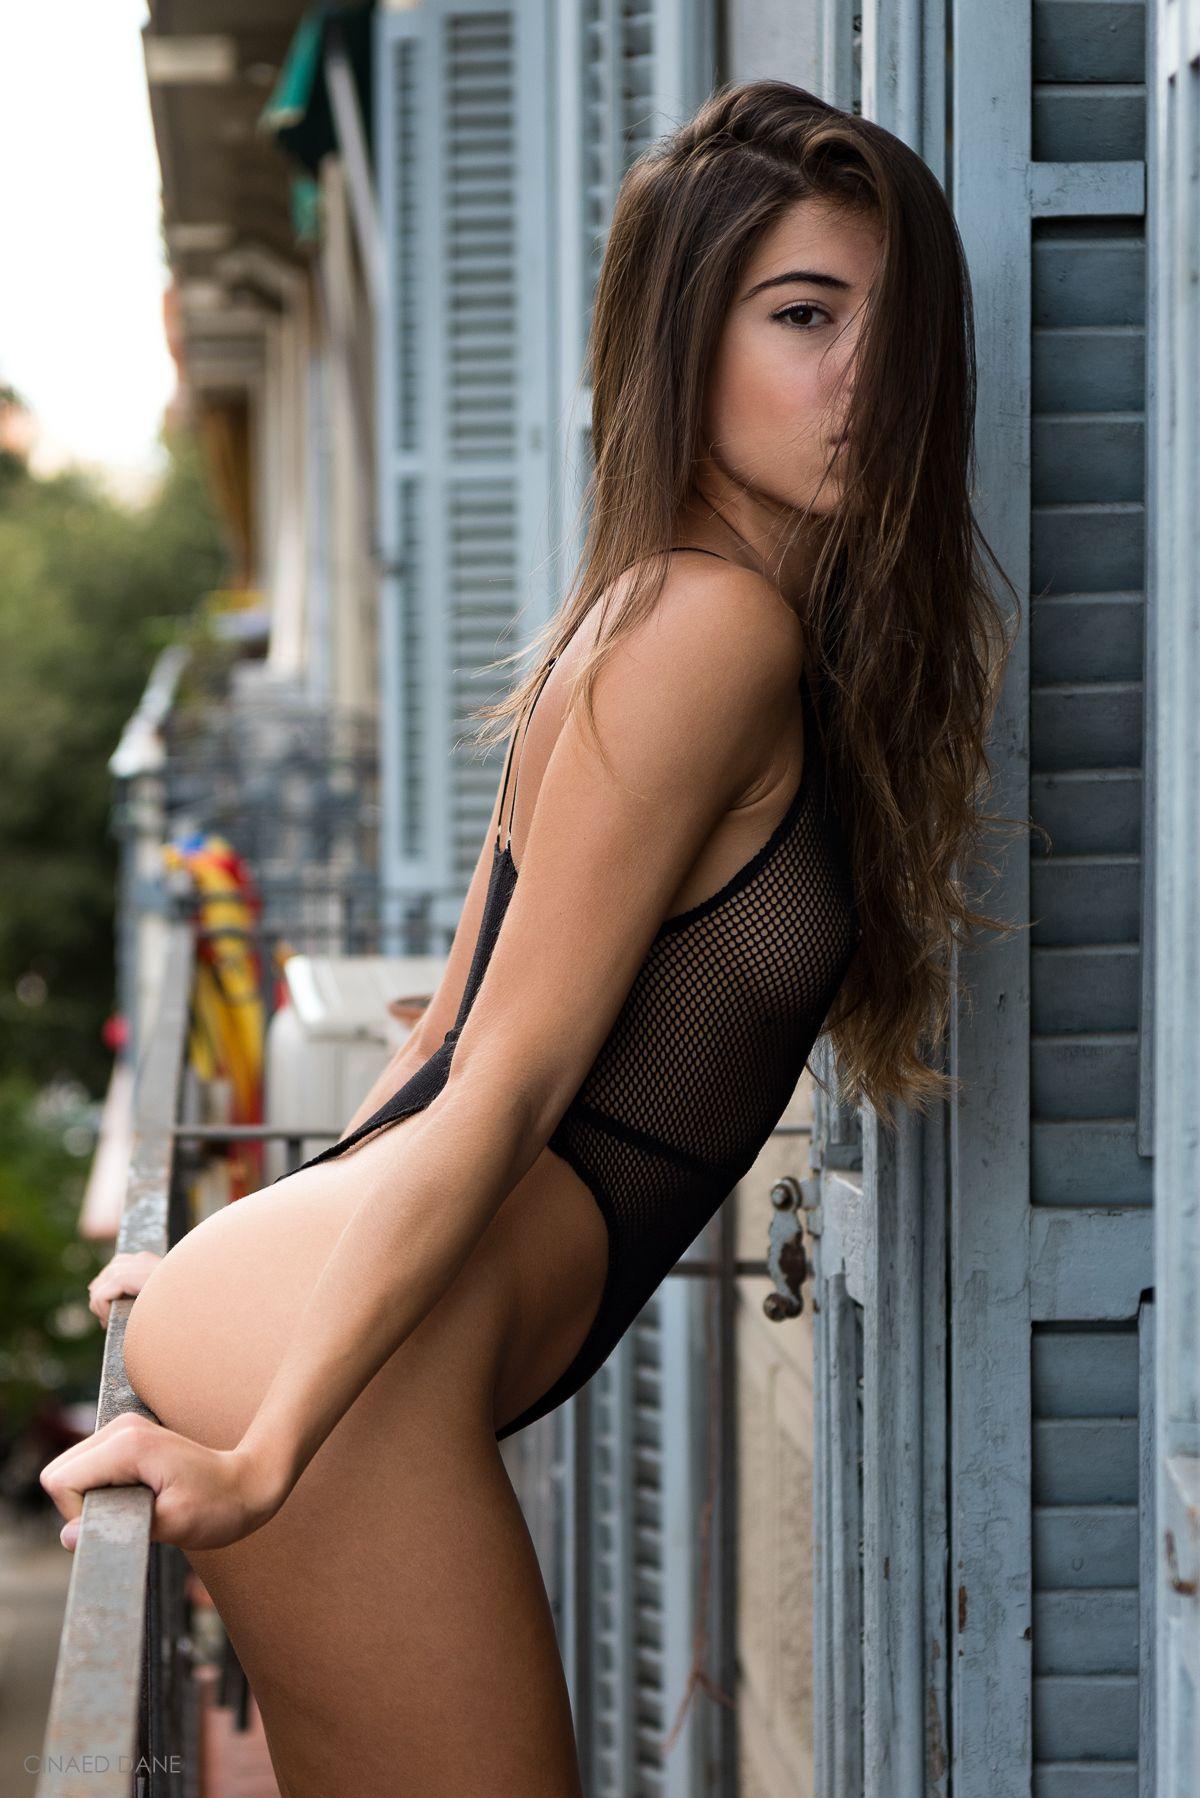 Porno Chiara Bianchino  naked (57 photos), Instagram, butt